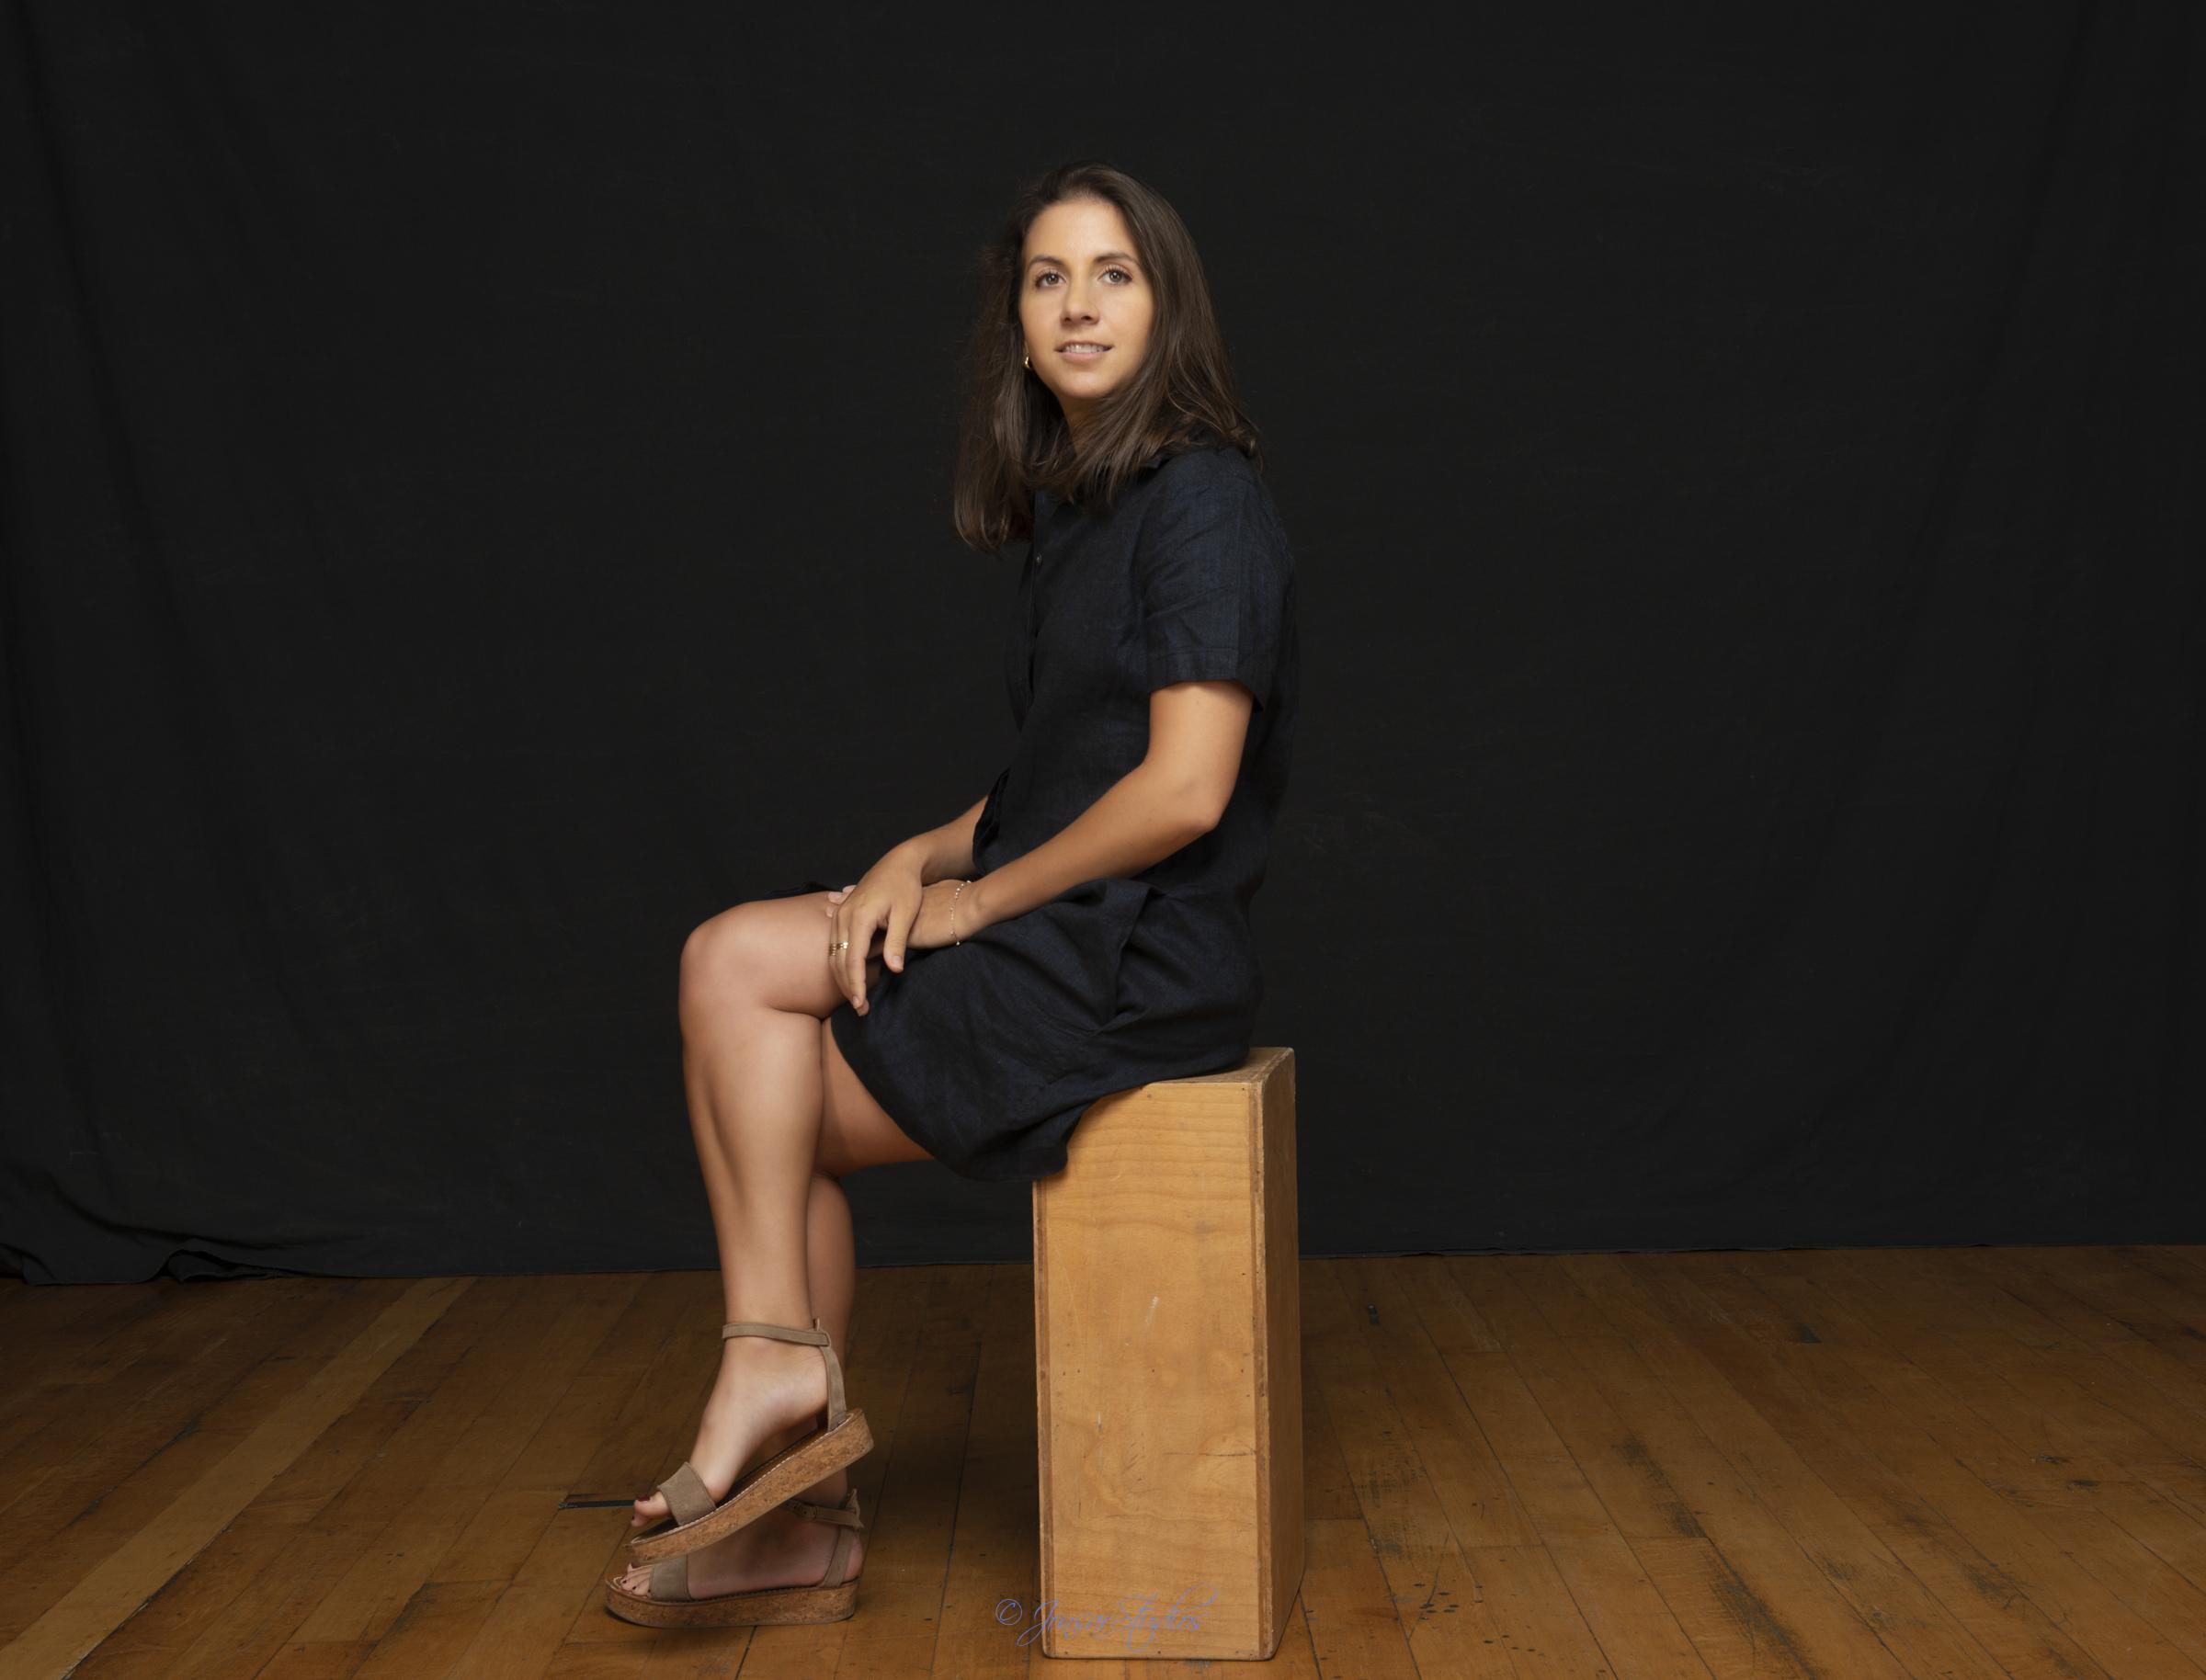 Color studio portrait of woman seated on apple box on black backdrop